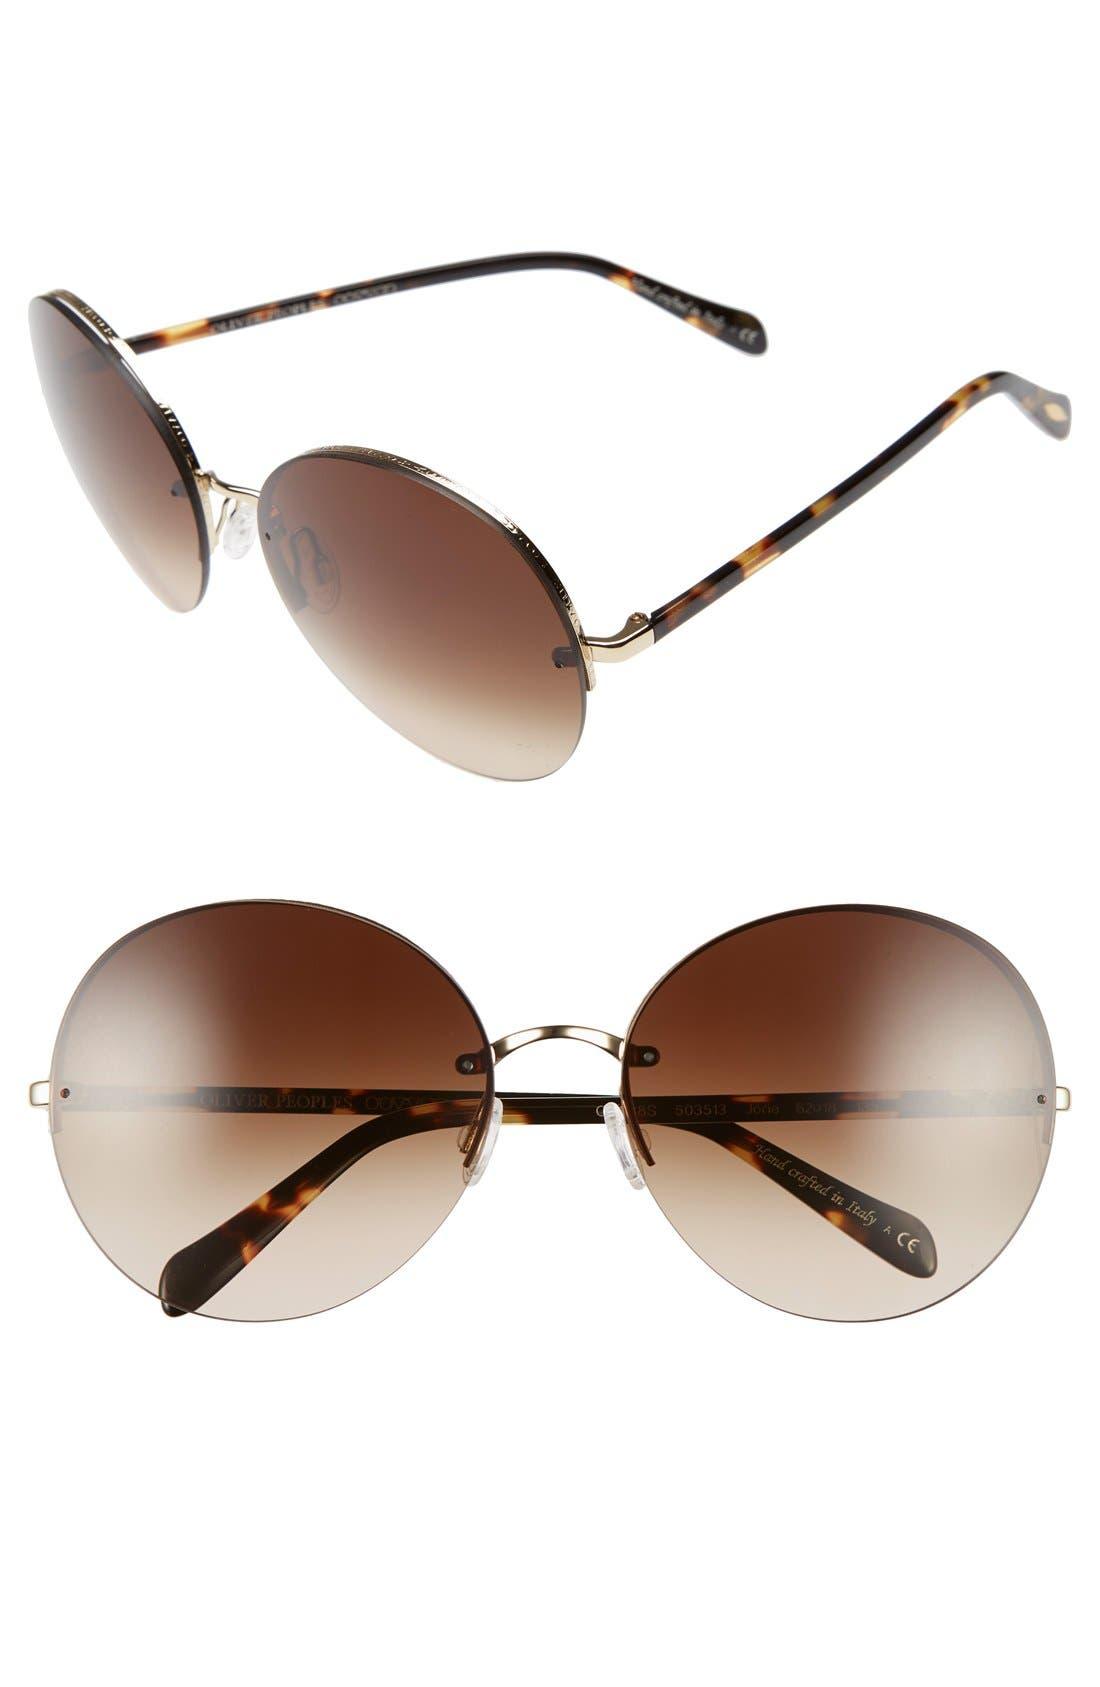 Main Image - Oliver Peoples Jorie 62mm Semi Rimless Sunglasses